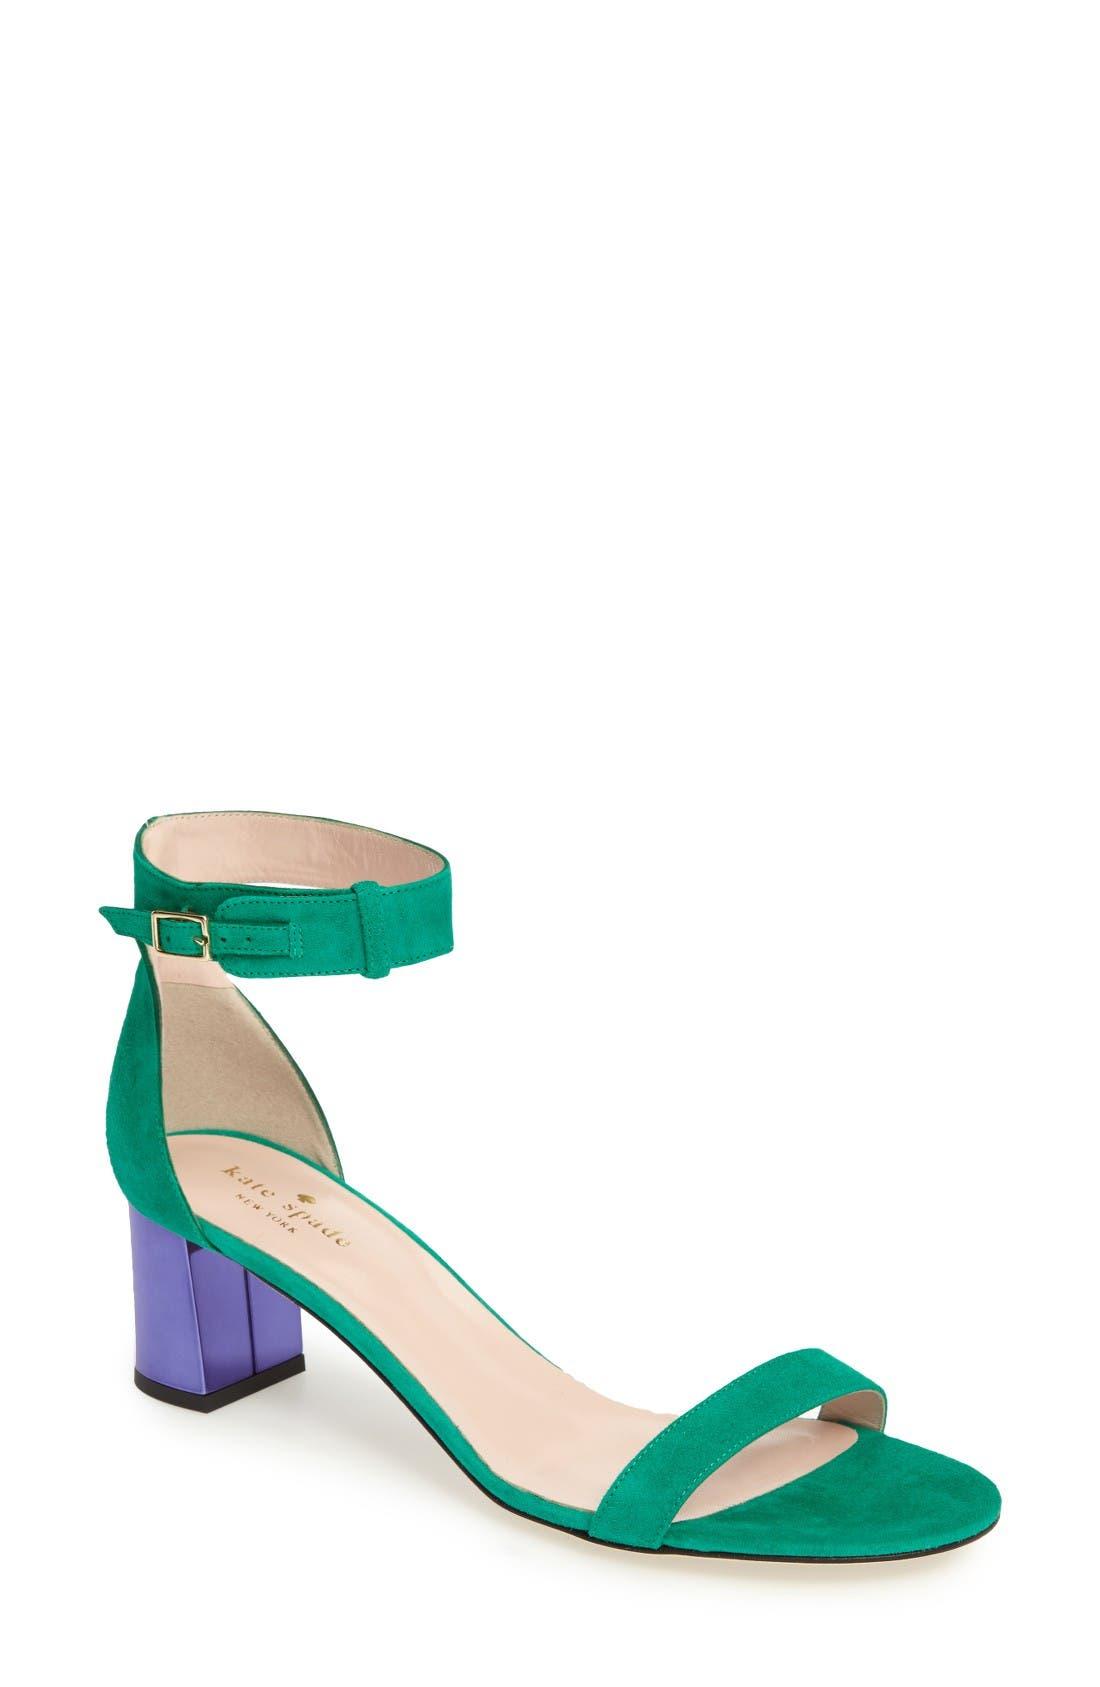 kate spade new york menorca ankle strap sandal (Women)